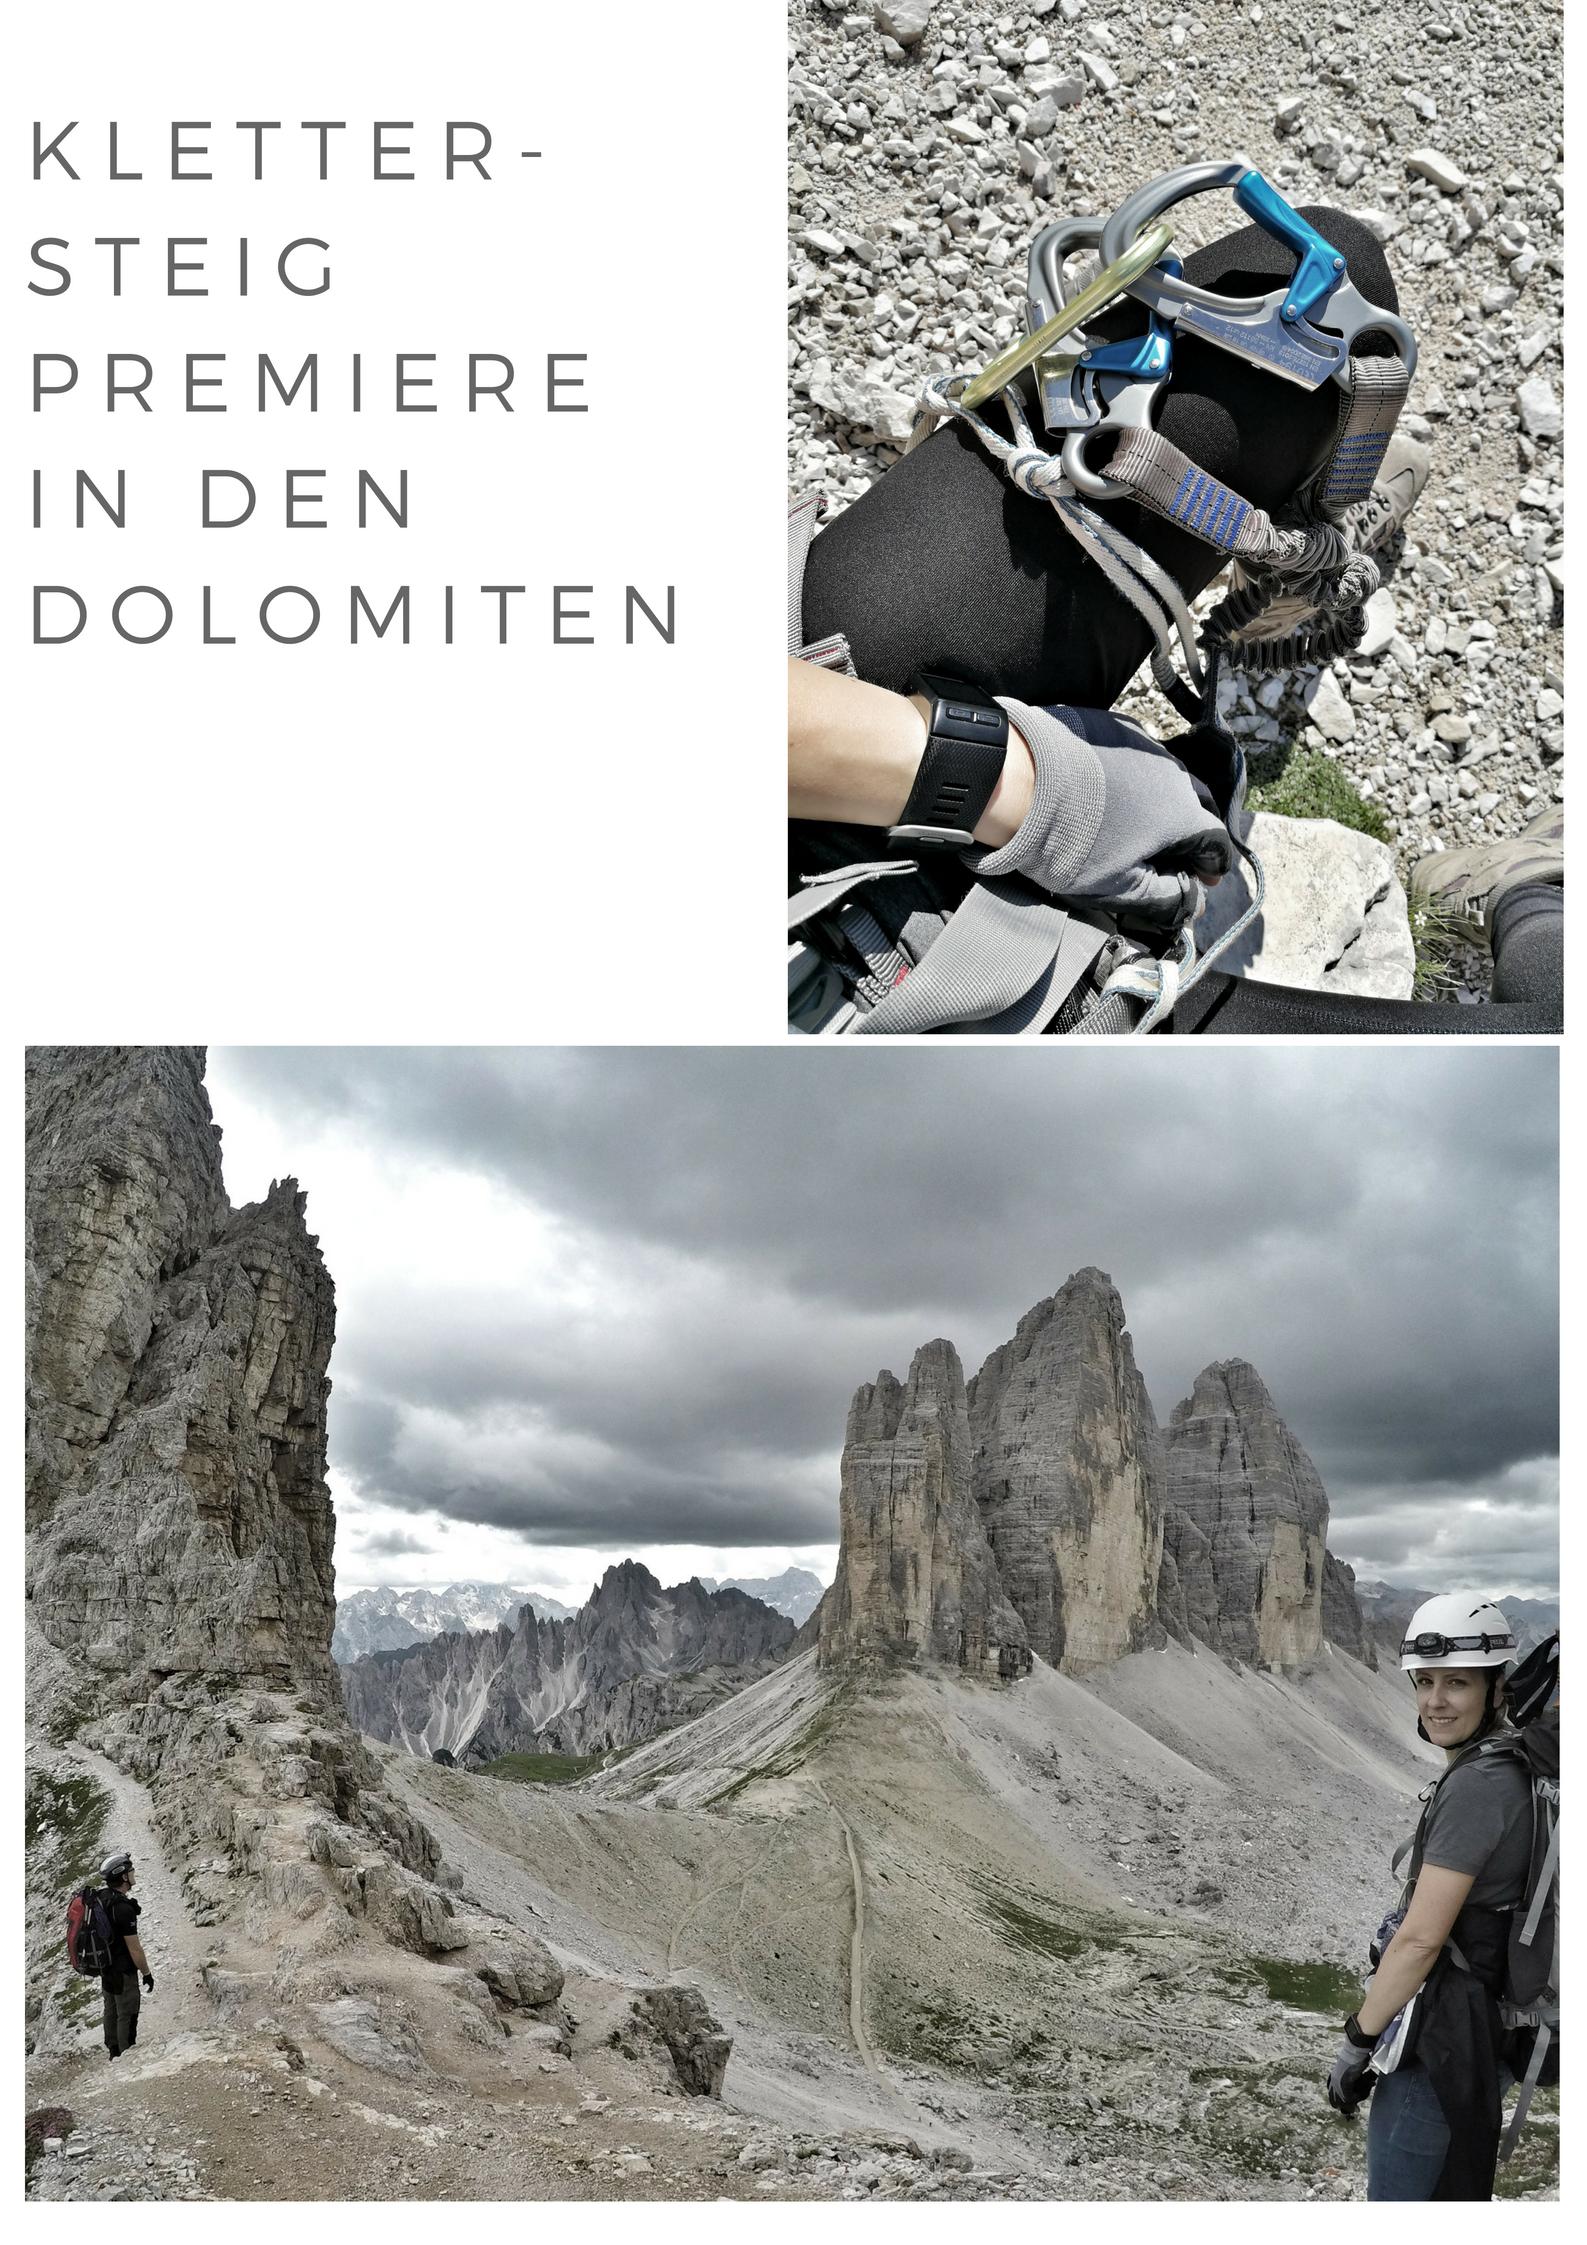 Klettersteig-Dolomiten-1.jpg